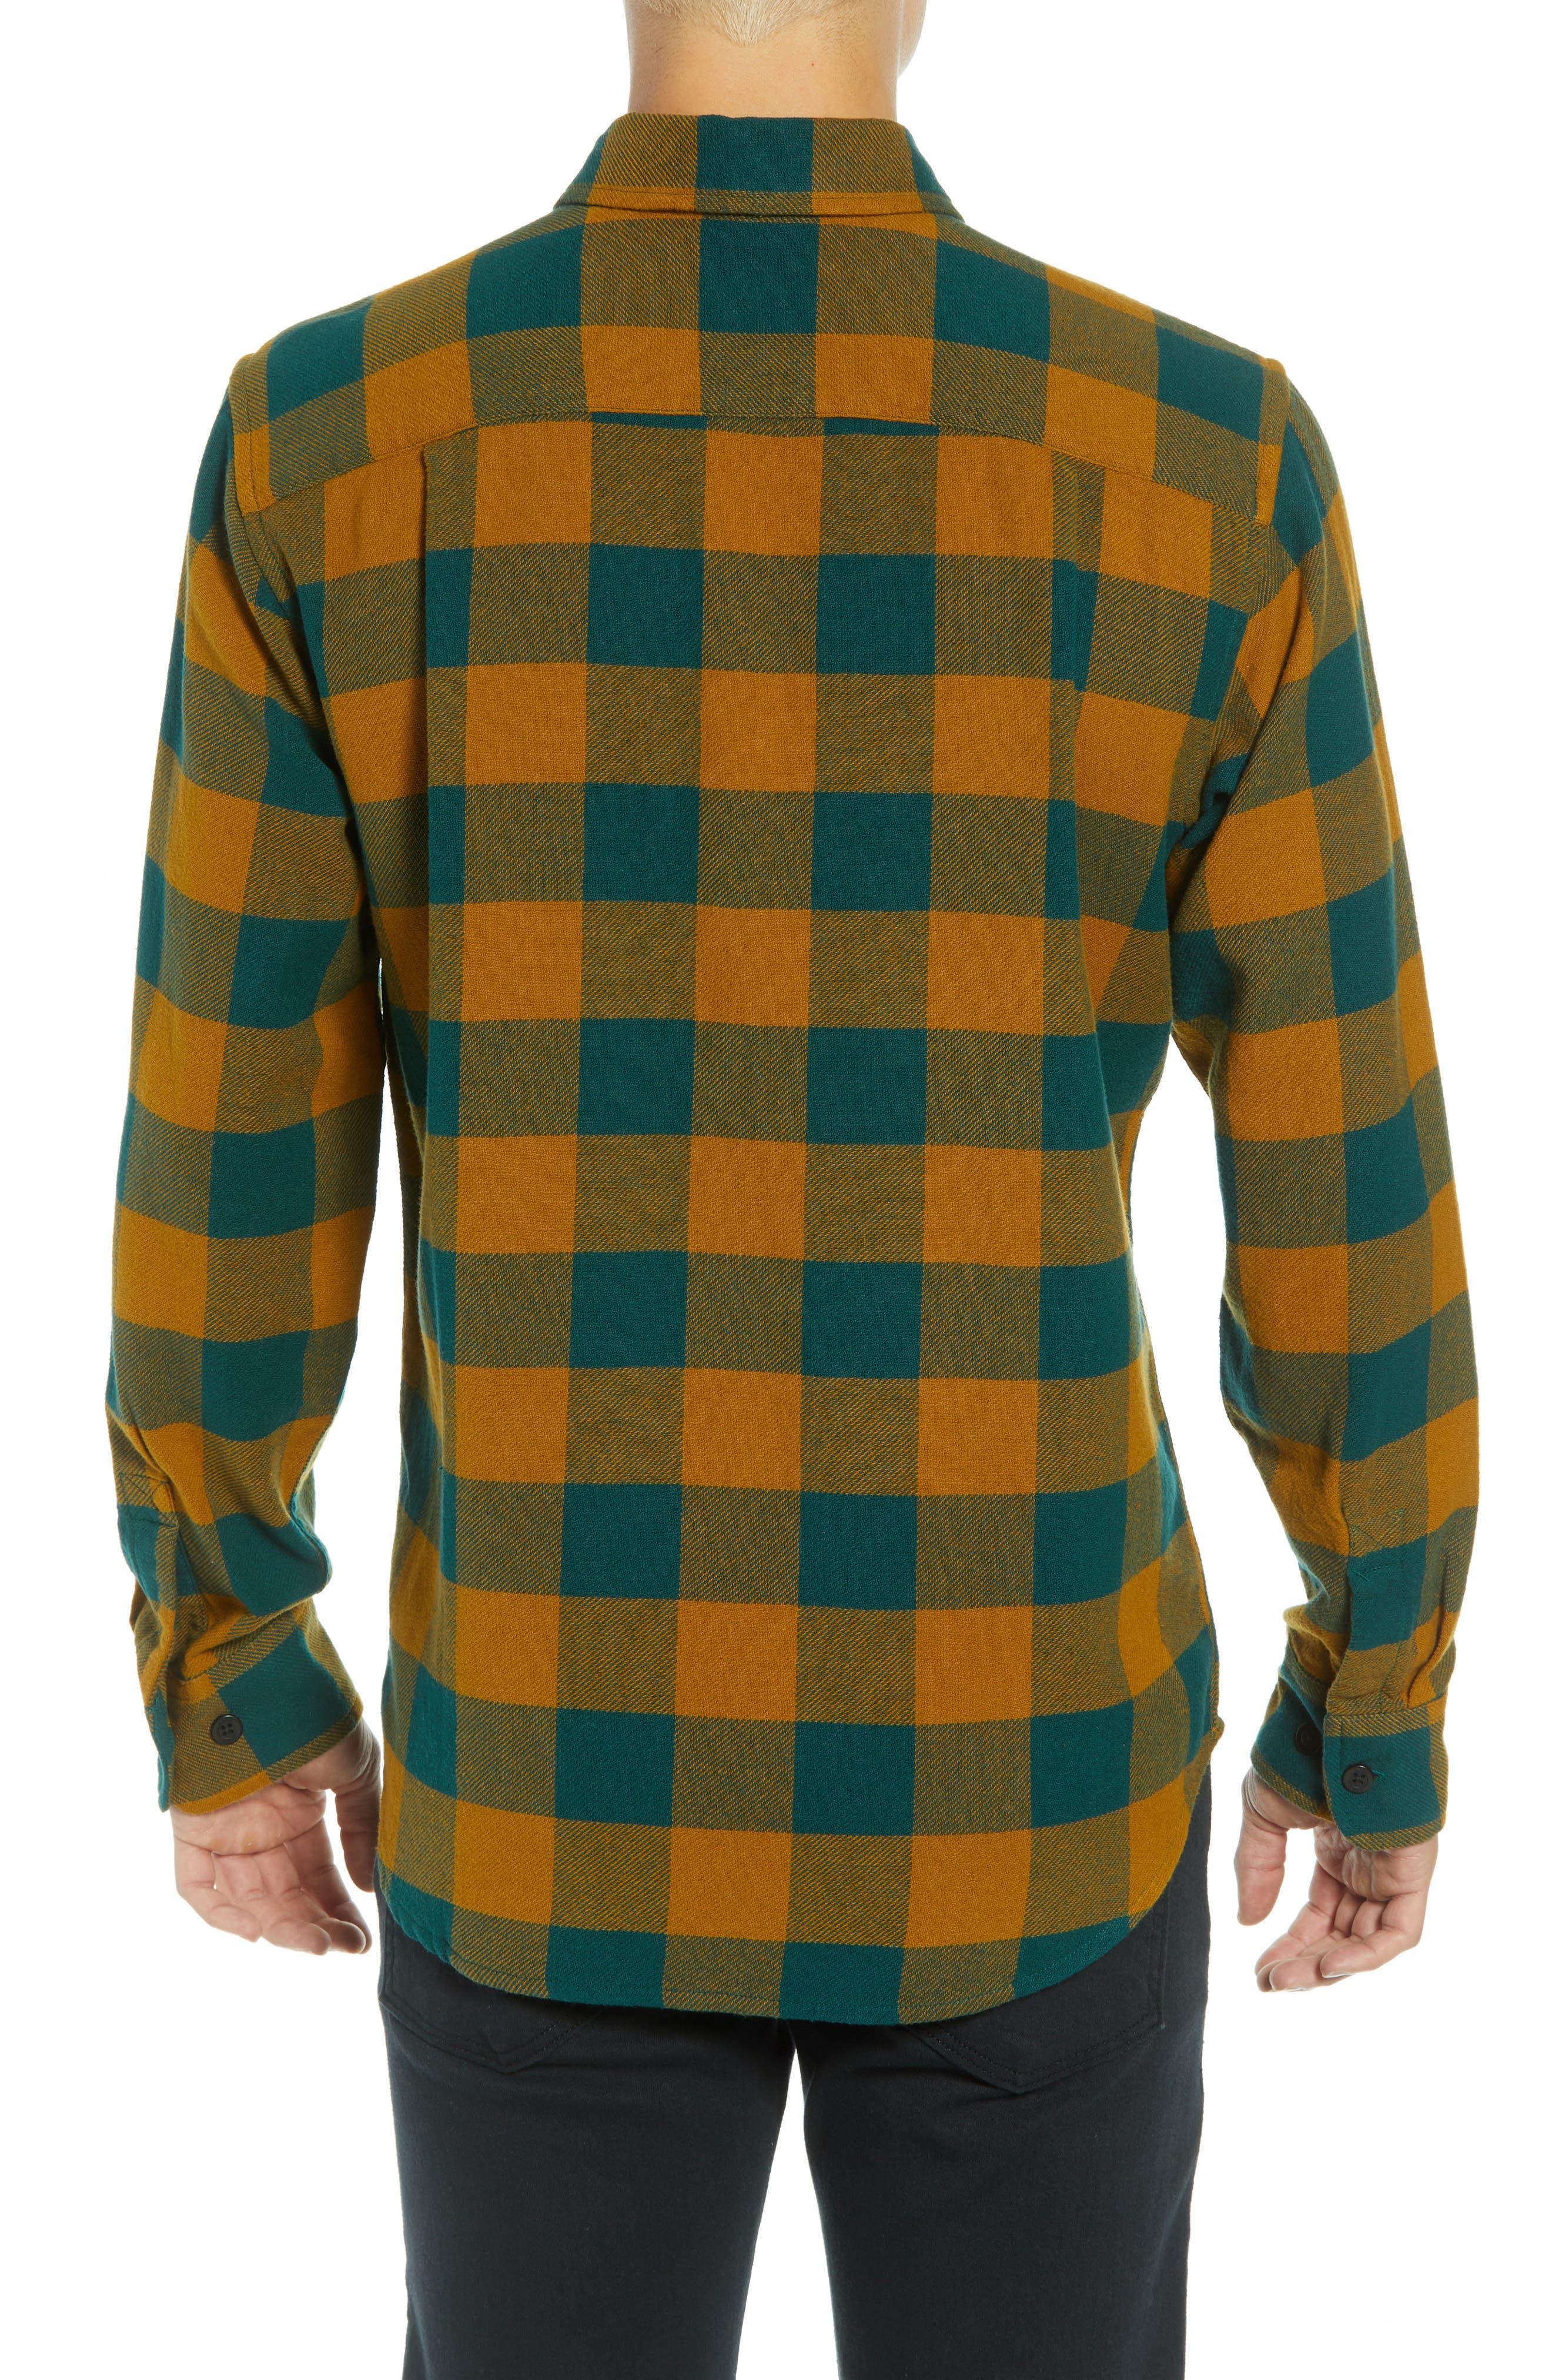 Vedder Buffalo Plaid Flannel Shirt,                             Alternate thumbnail 3, color,                             DARK TEAL MULTI